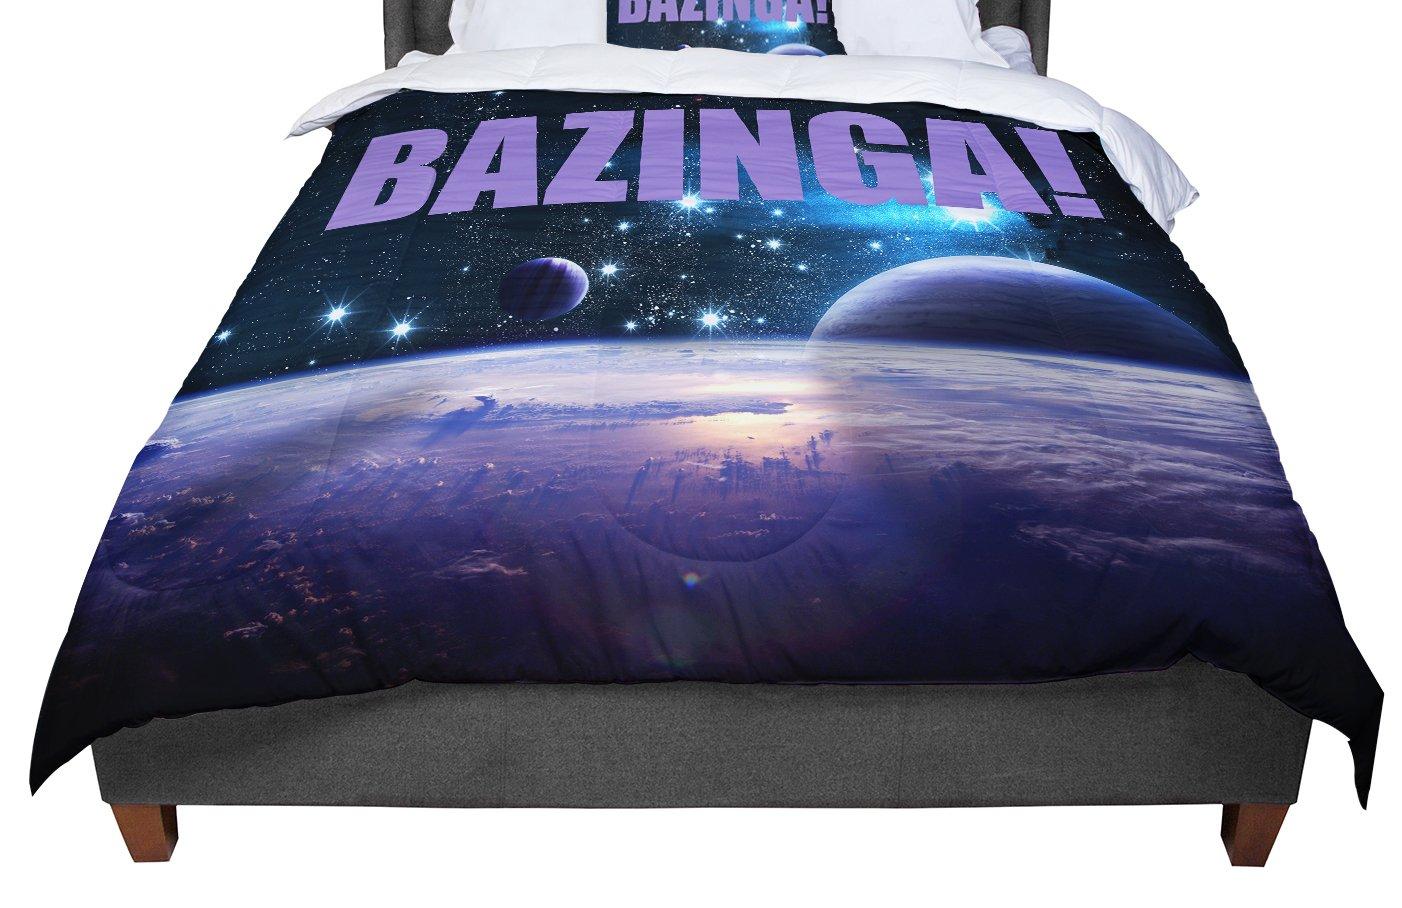 KESS InHouse KESS Original Bazinga Purple Space King 104 X 88 Cal King Comforter